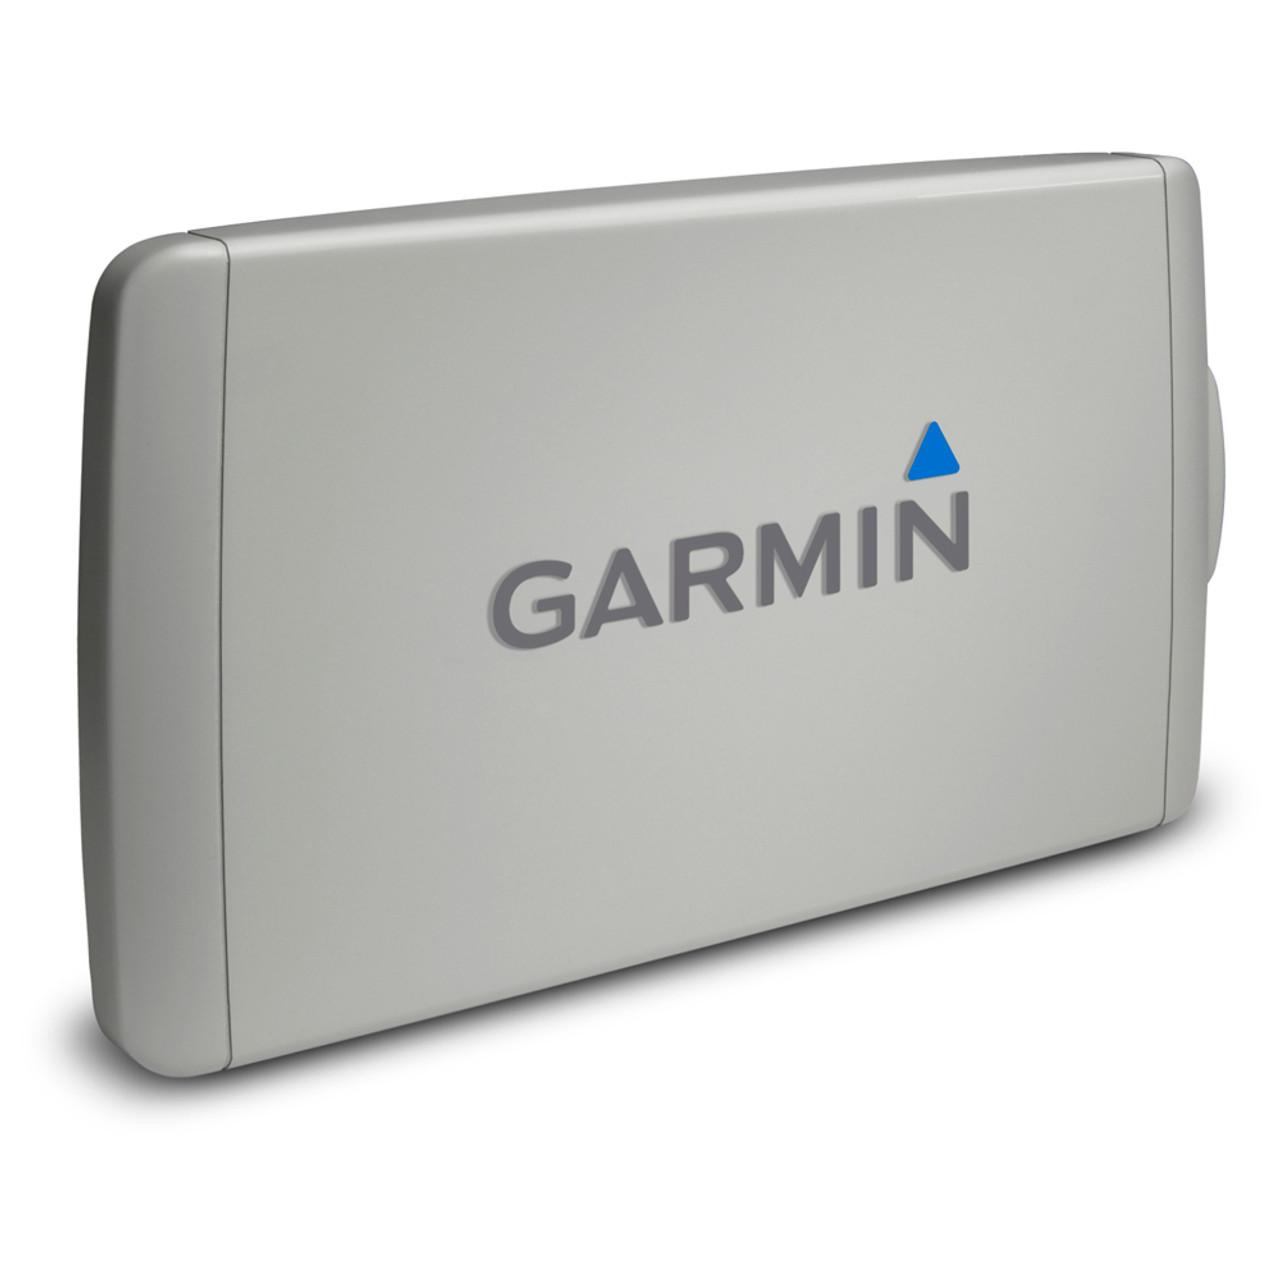 Garmin Protective Cover f\/echoMAP 73dv & 7Xsv Series